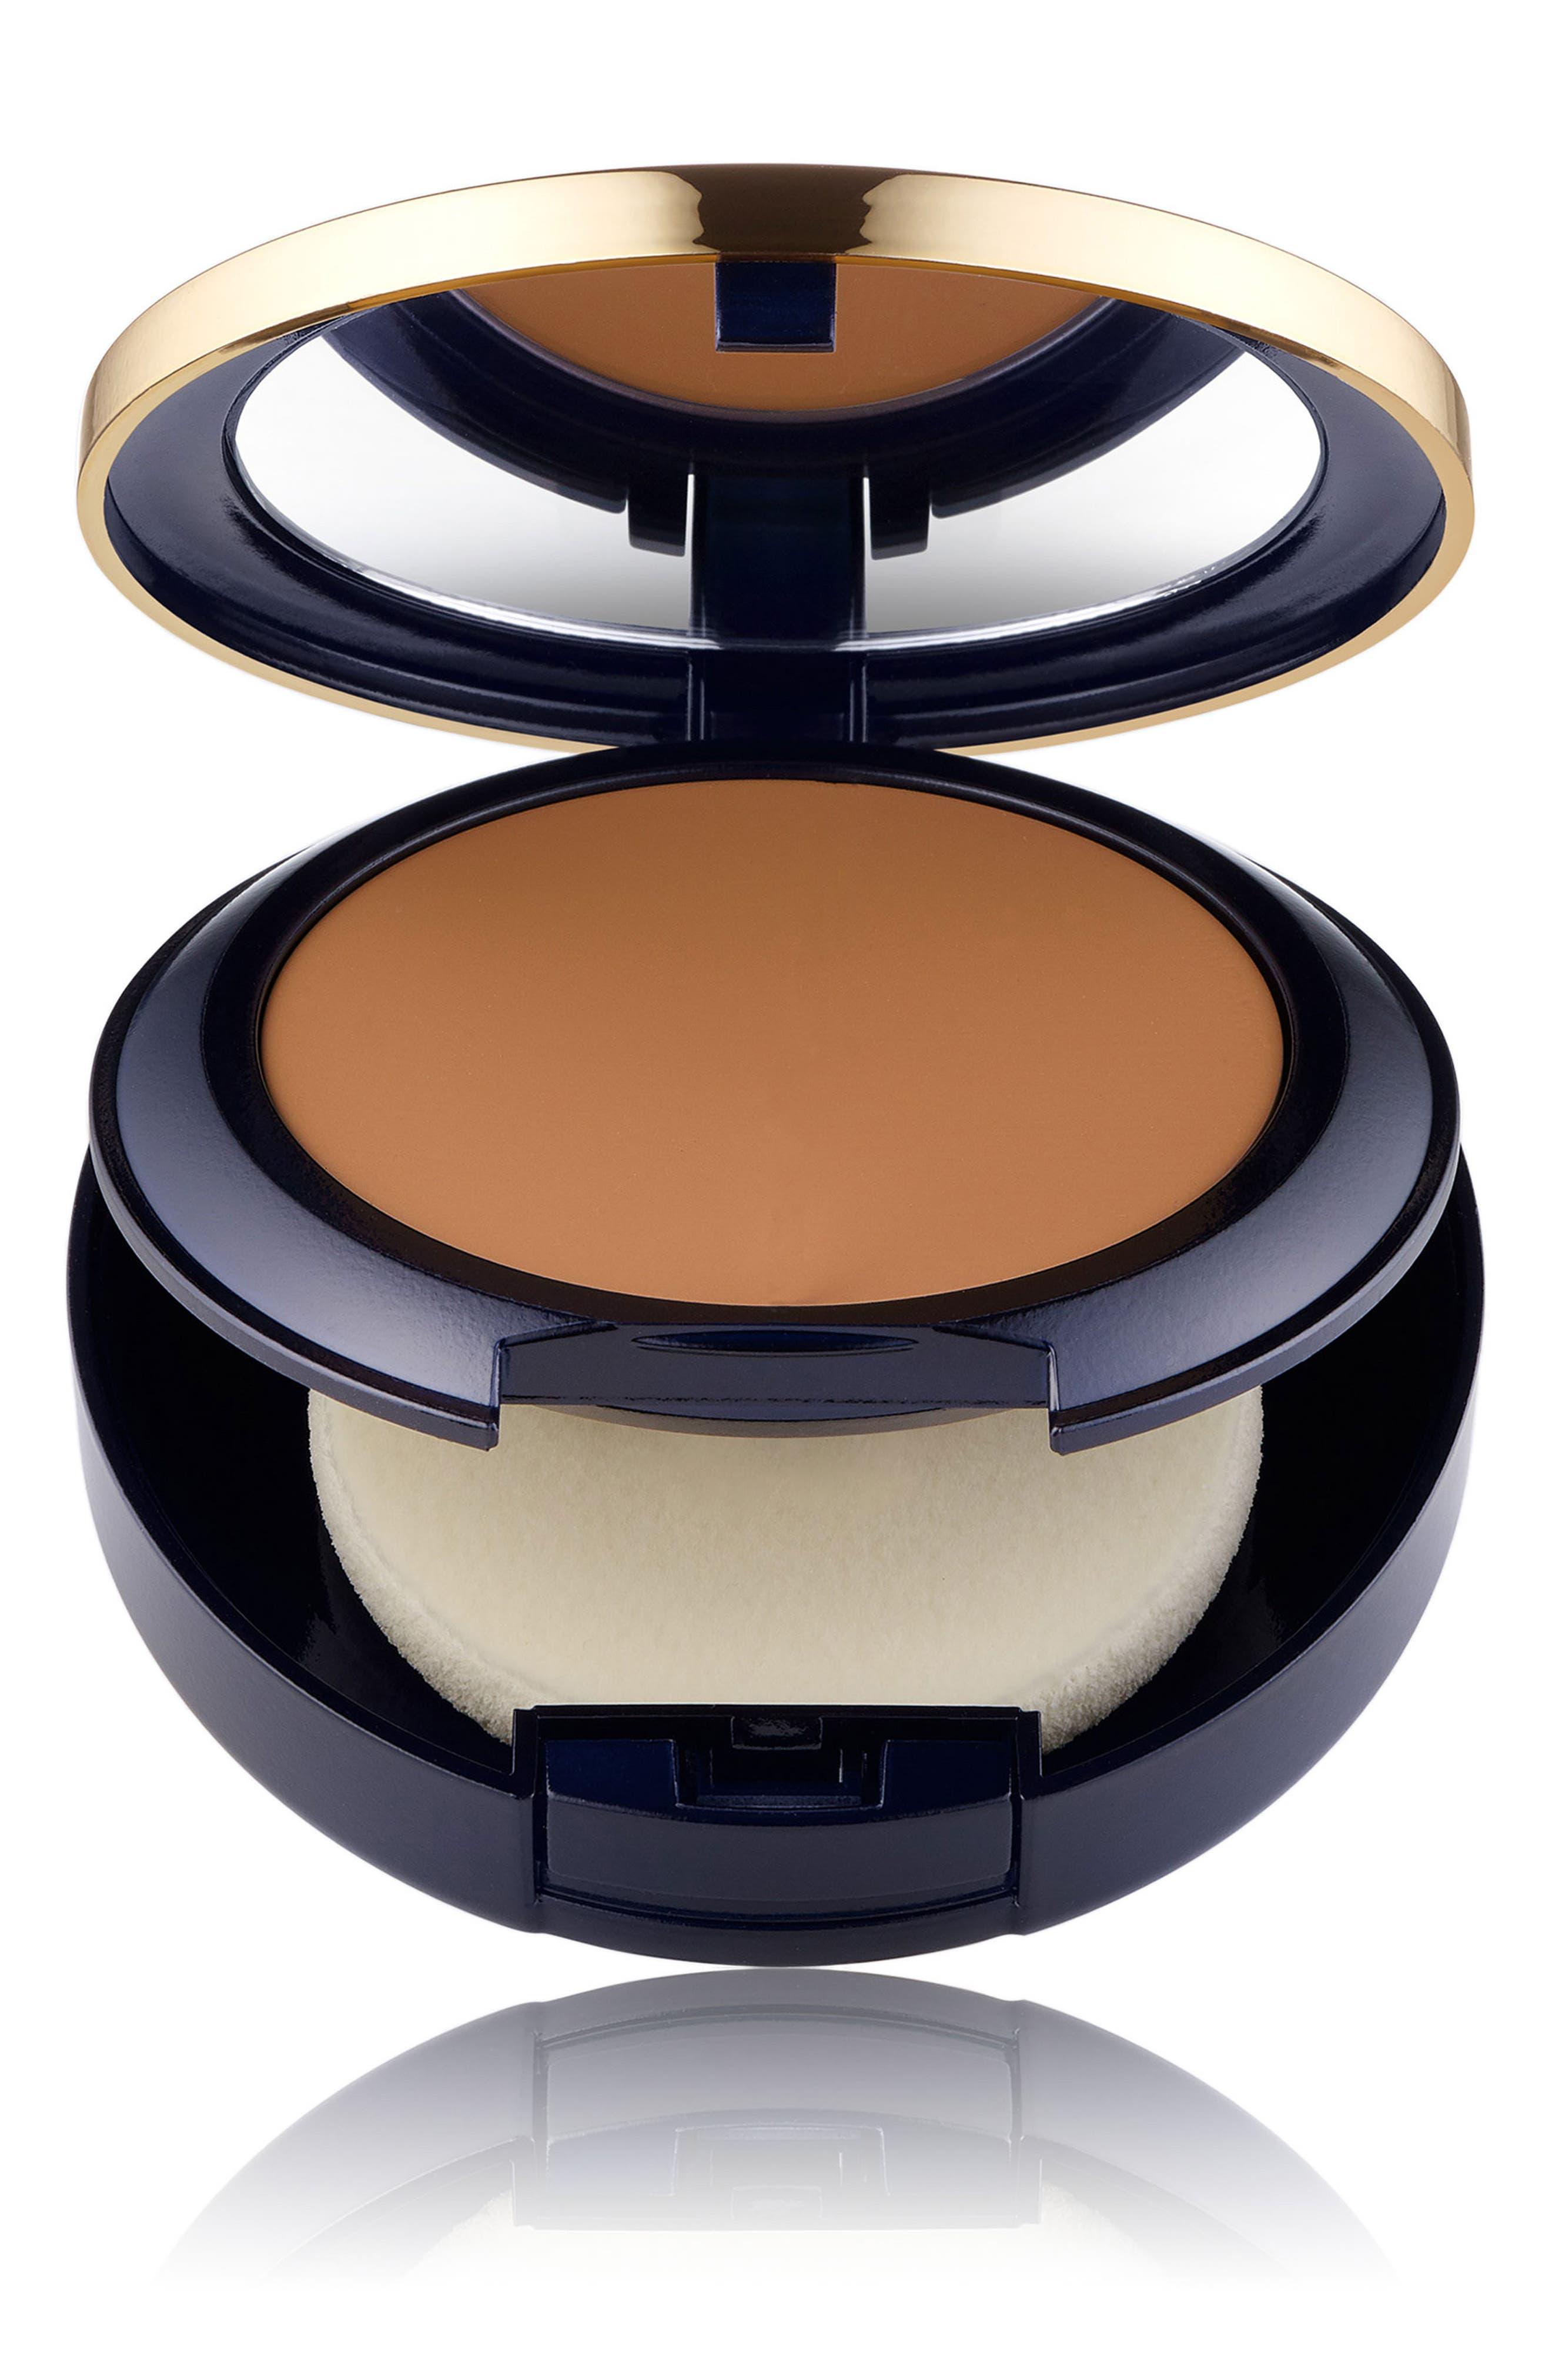 Estee Lauder Double Wear Stay In Place Matte Powder Foundation - 7N1 Deep Amber